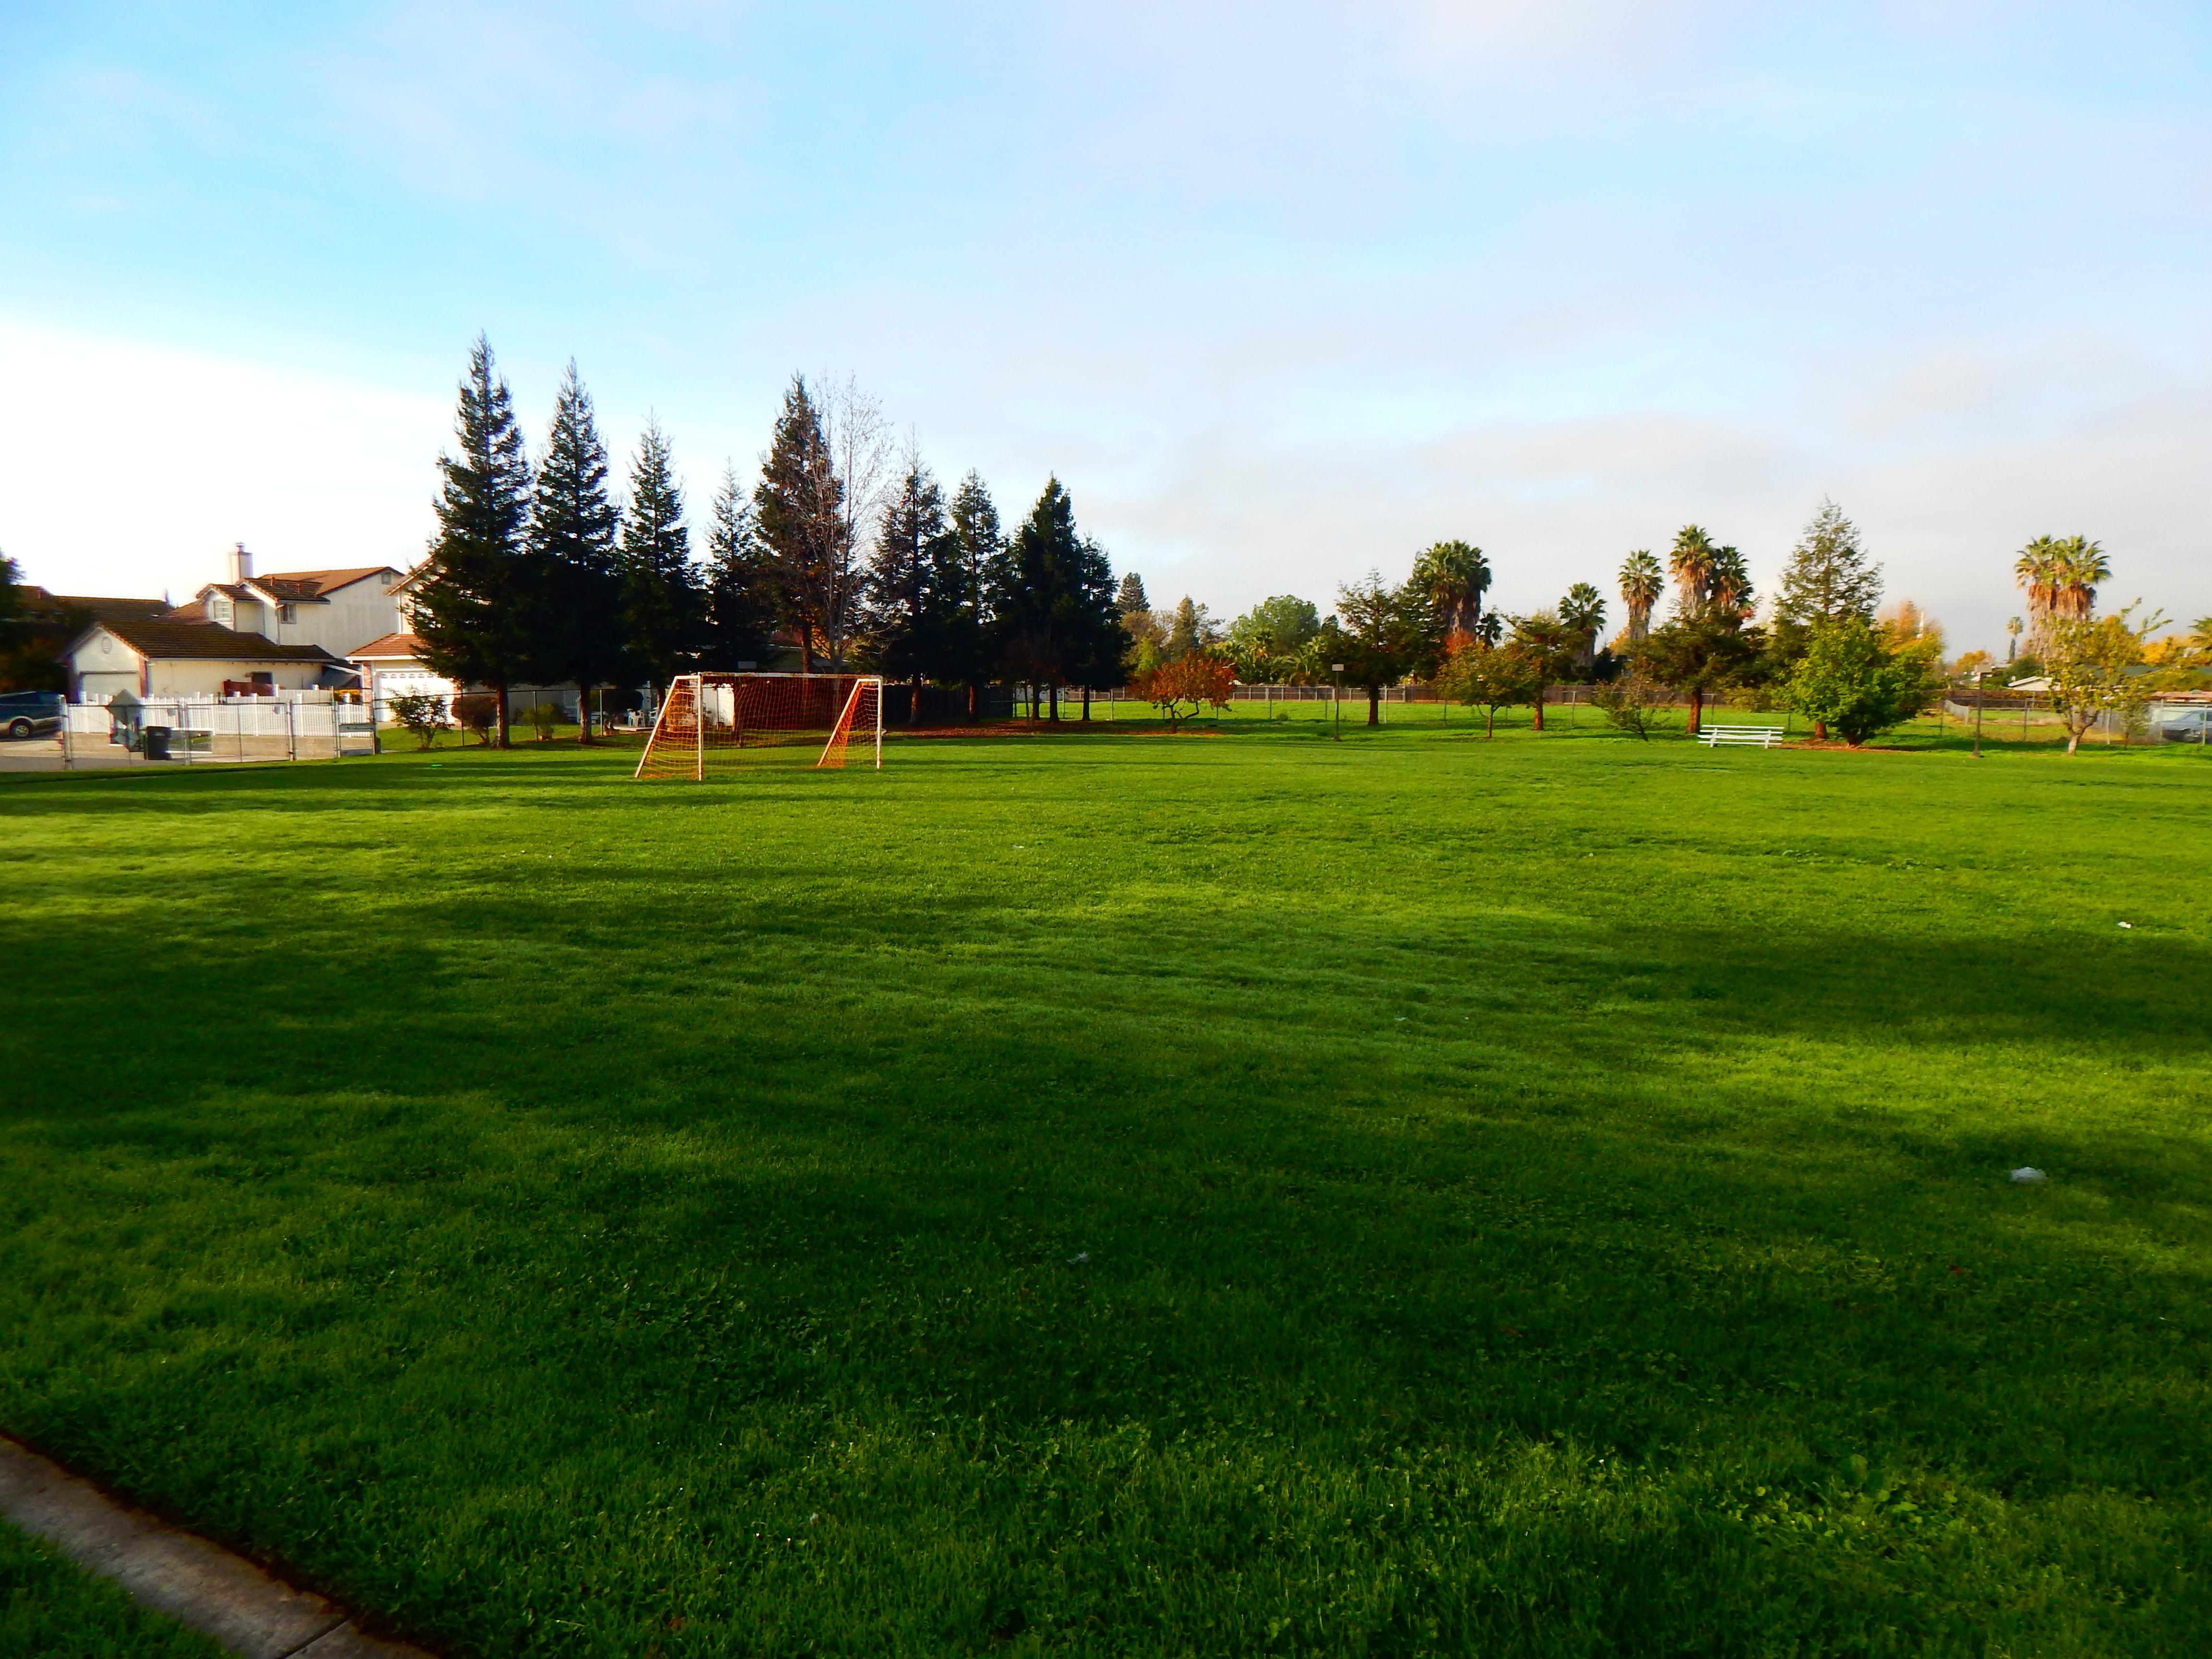 Teichert Outdoor Yard